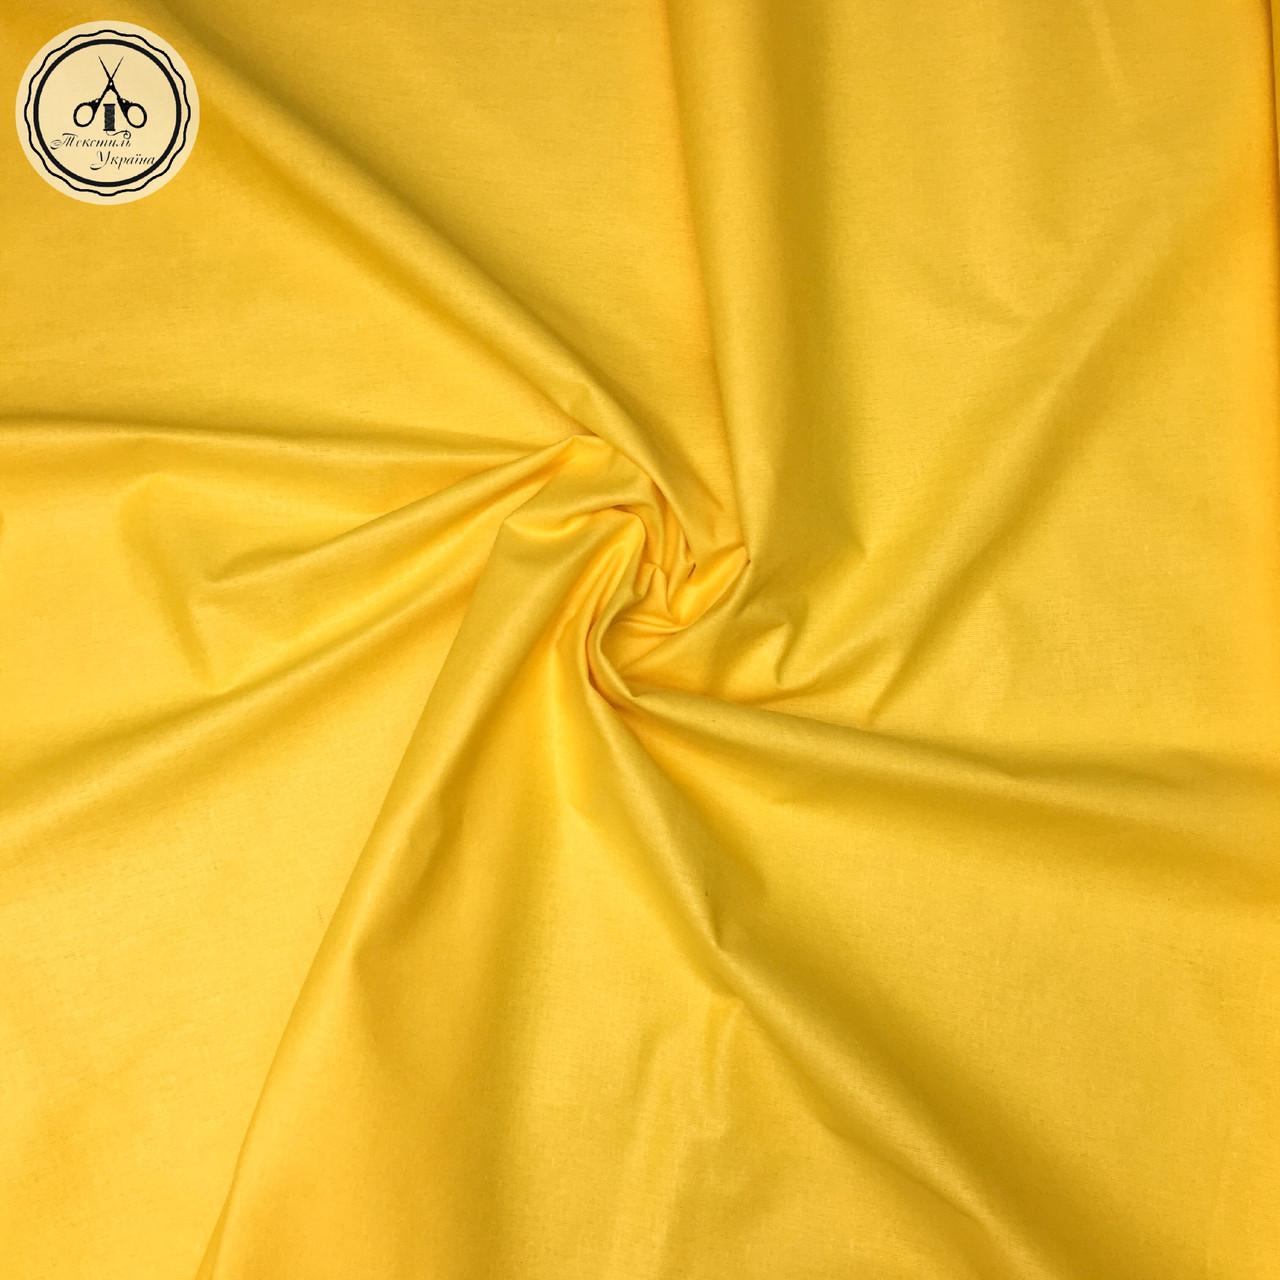 Польская хлопковая ткань жёлтая 160 см